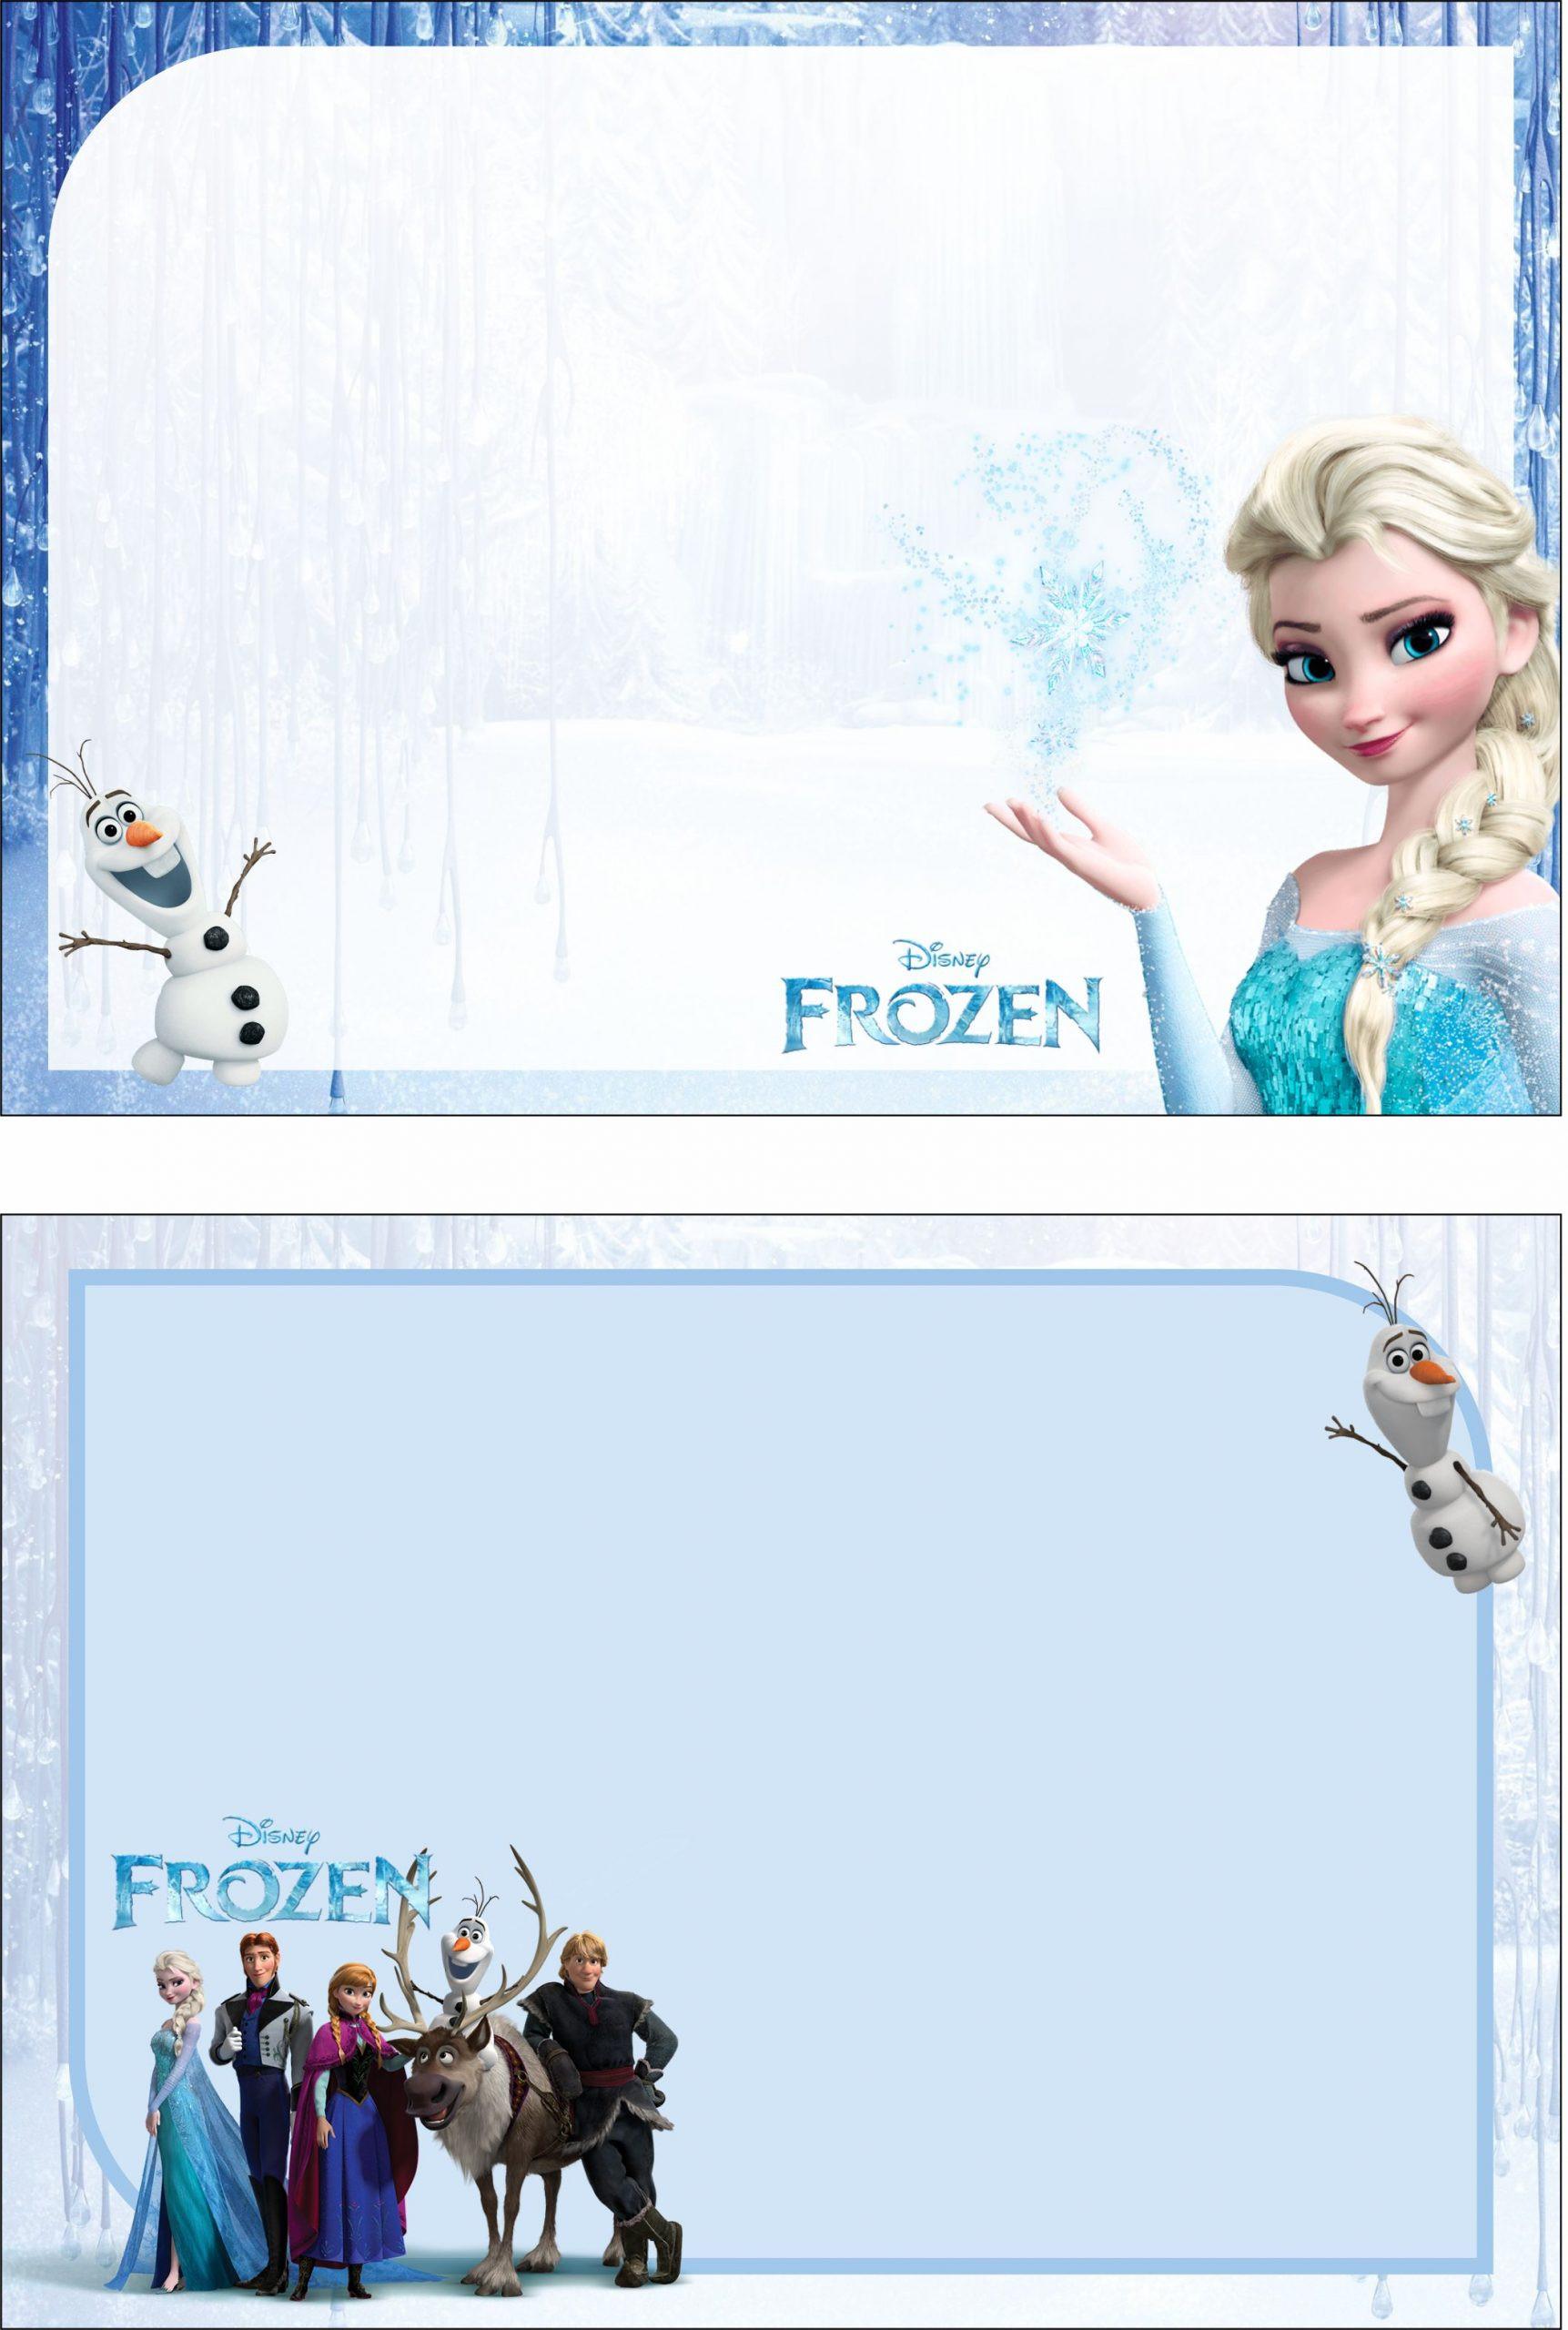 Frozen Invitations Printable Free – Frozen 2 Birthday Party Kit Templates – Free